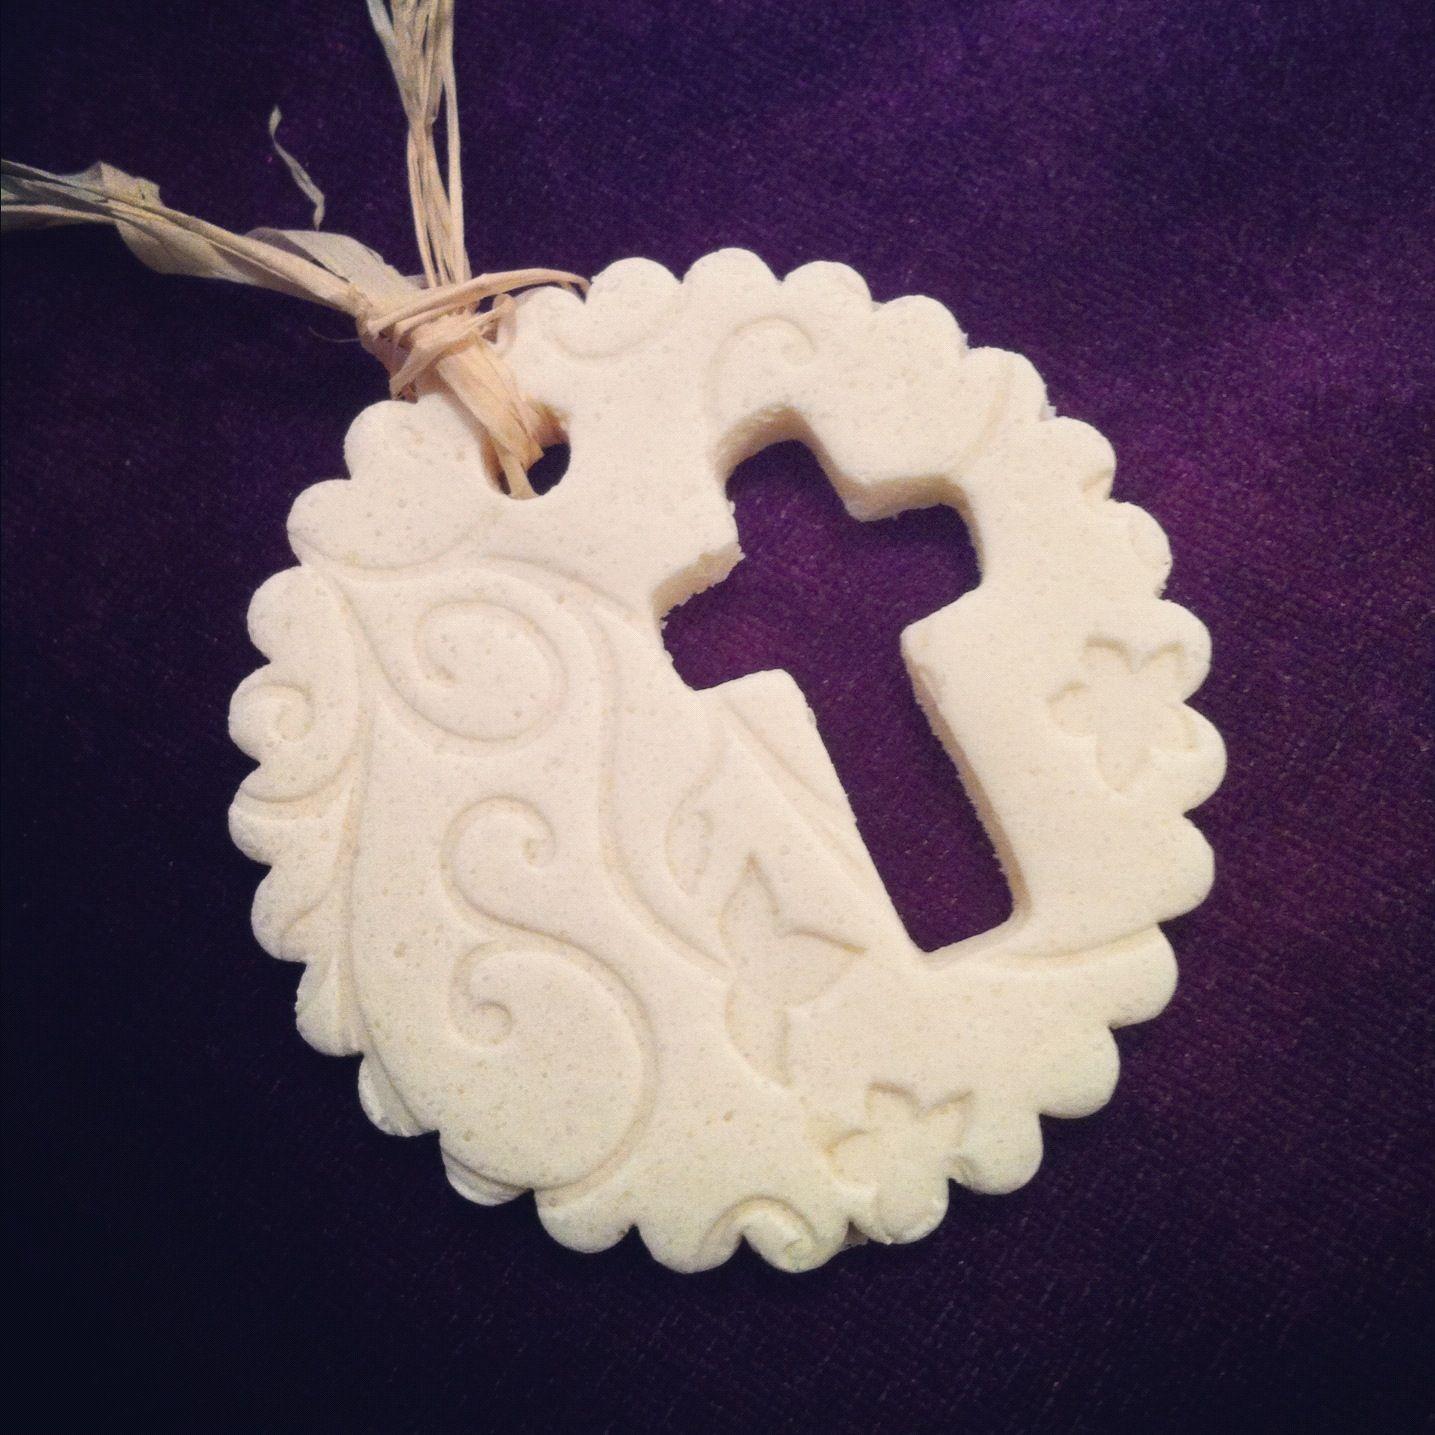 Christian Christmas Craft Ideas Part - 42: Salt Dough Christmas Ornaments I Made- Nailed It!!! Christian Christmas  CraftsChristmas LoveChristmas IdeasSalt ...